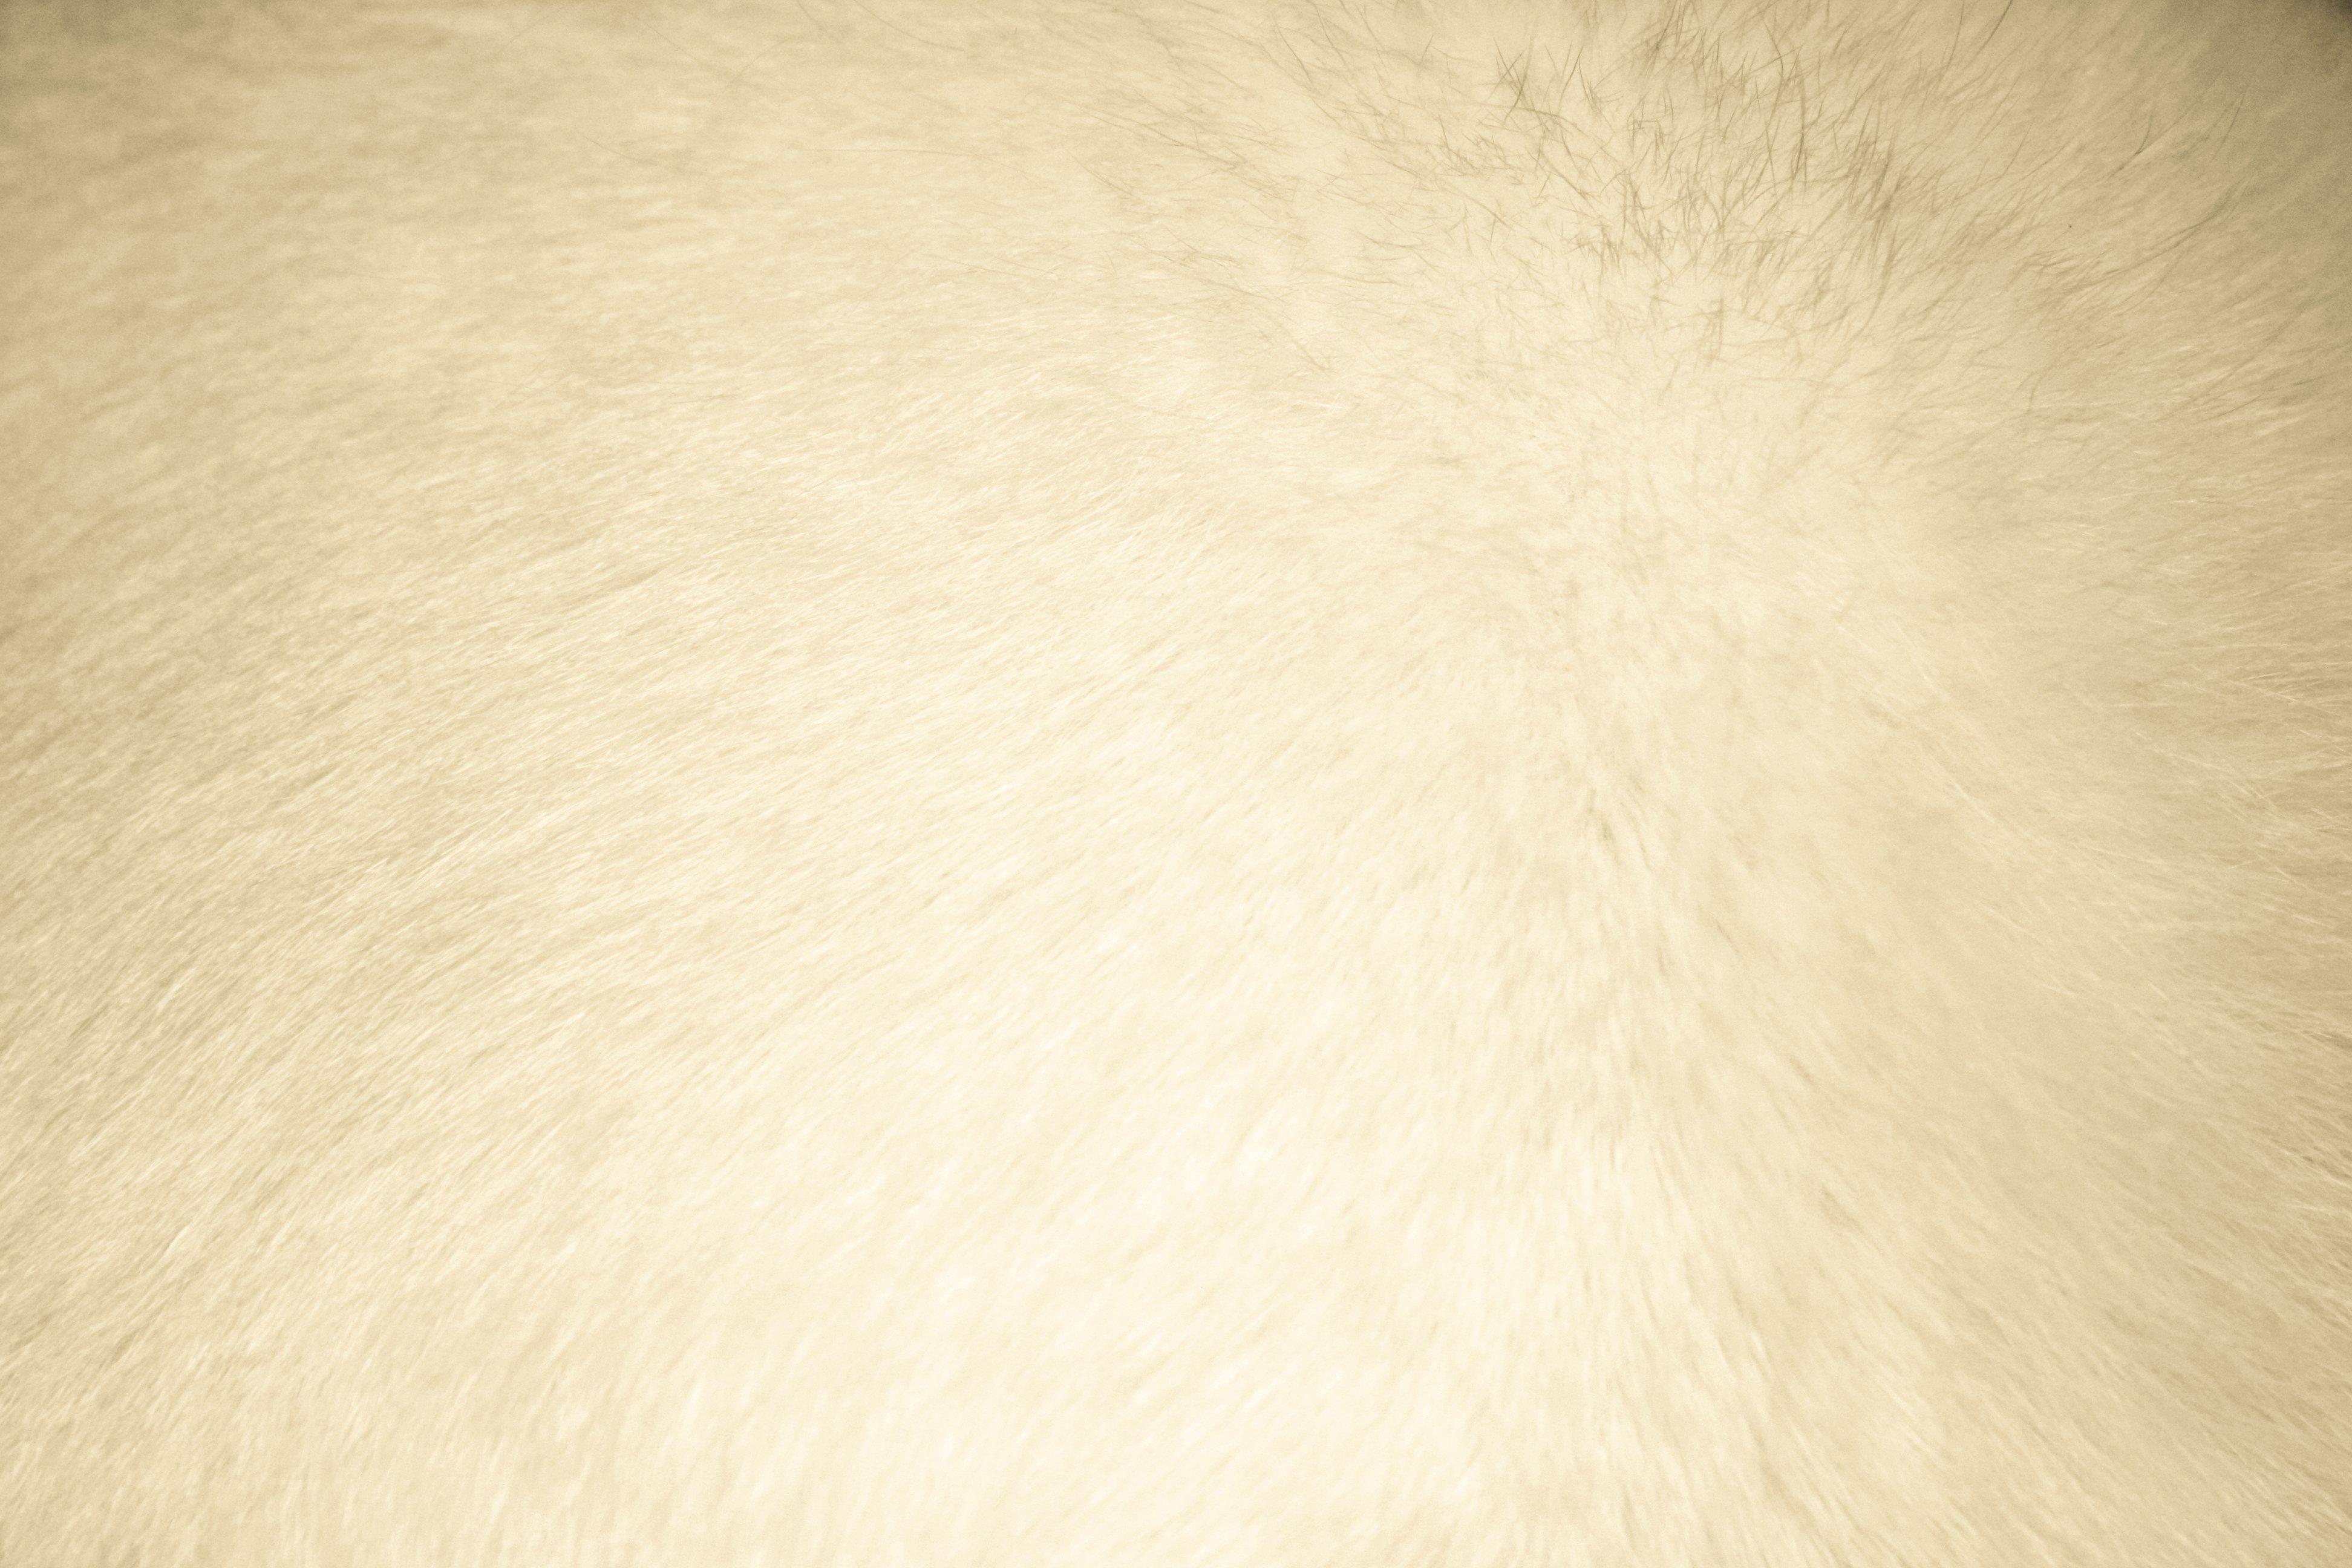 Wallpapers beige   Imagui 3888x2592